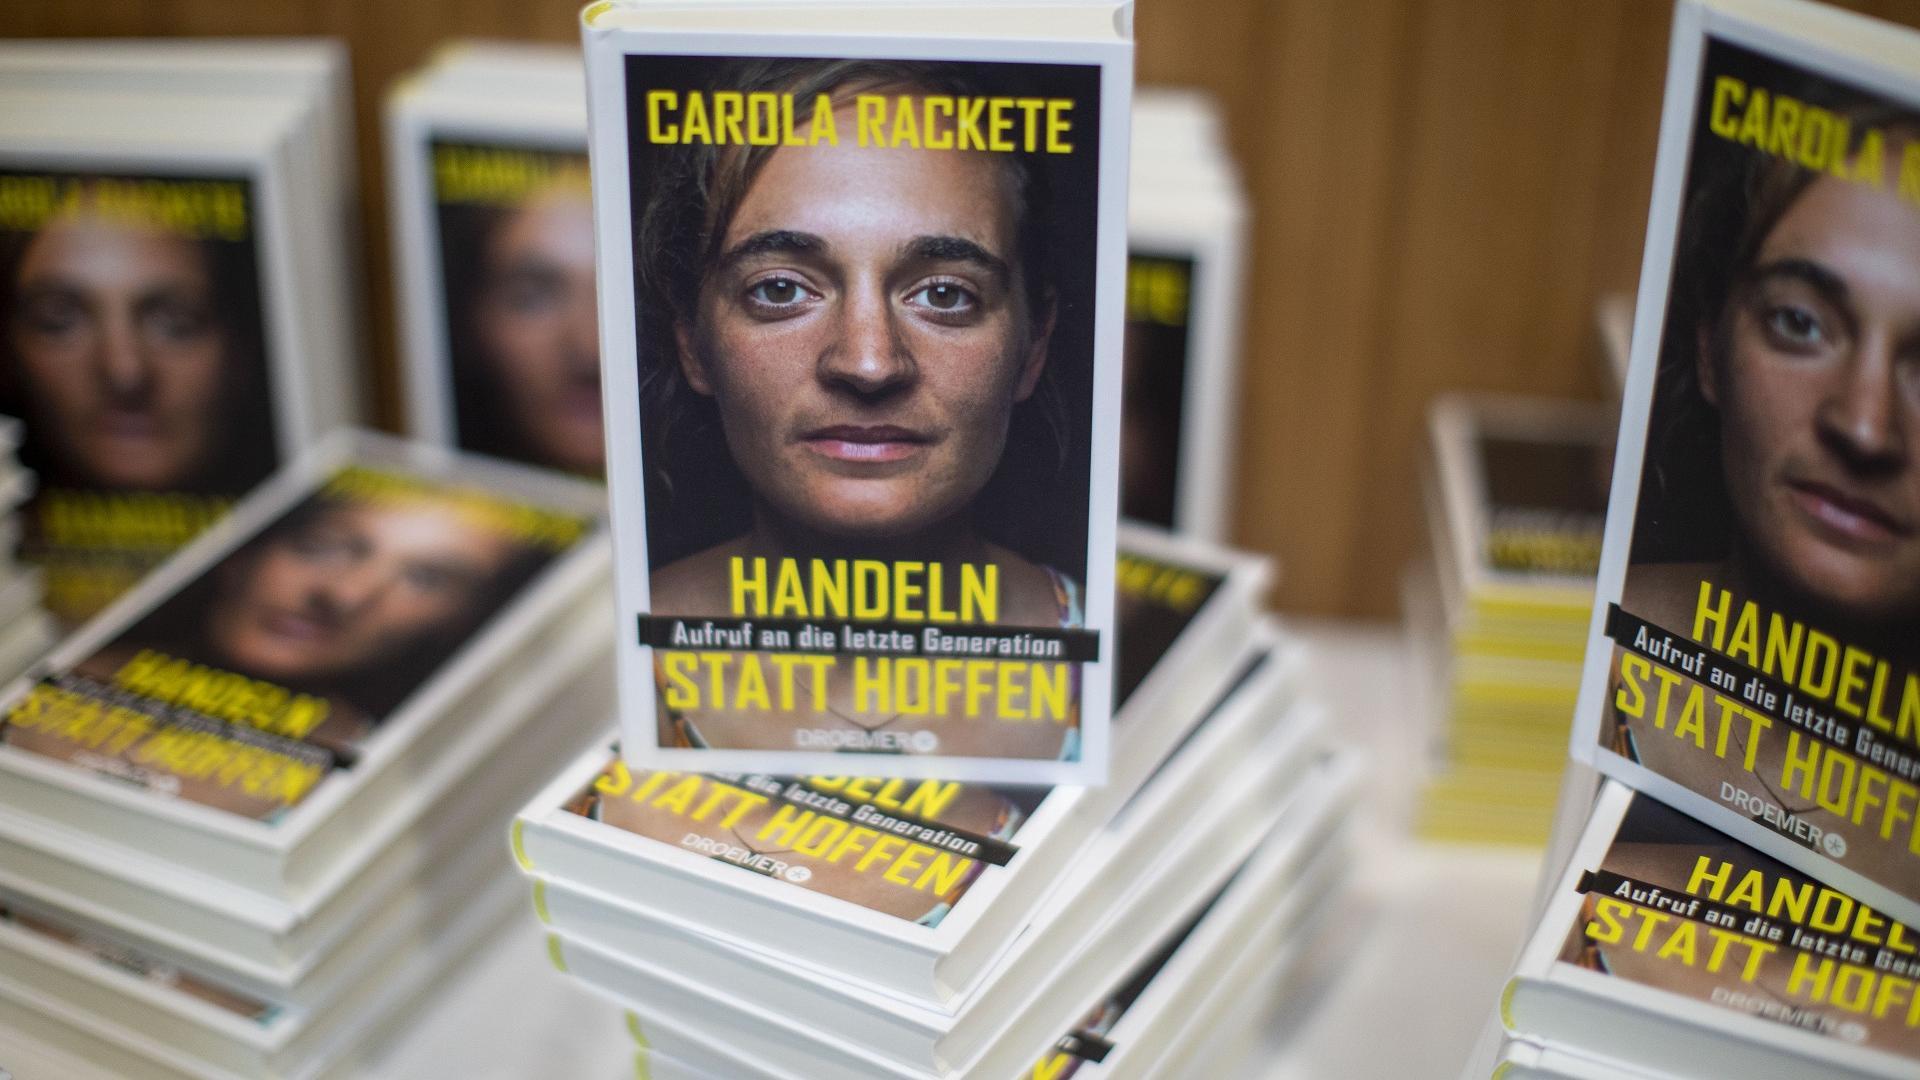 Carola Racketes erstes Buch